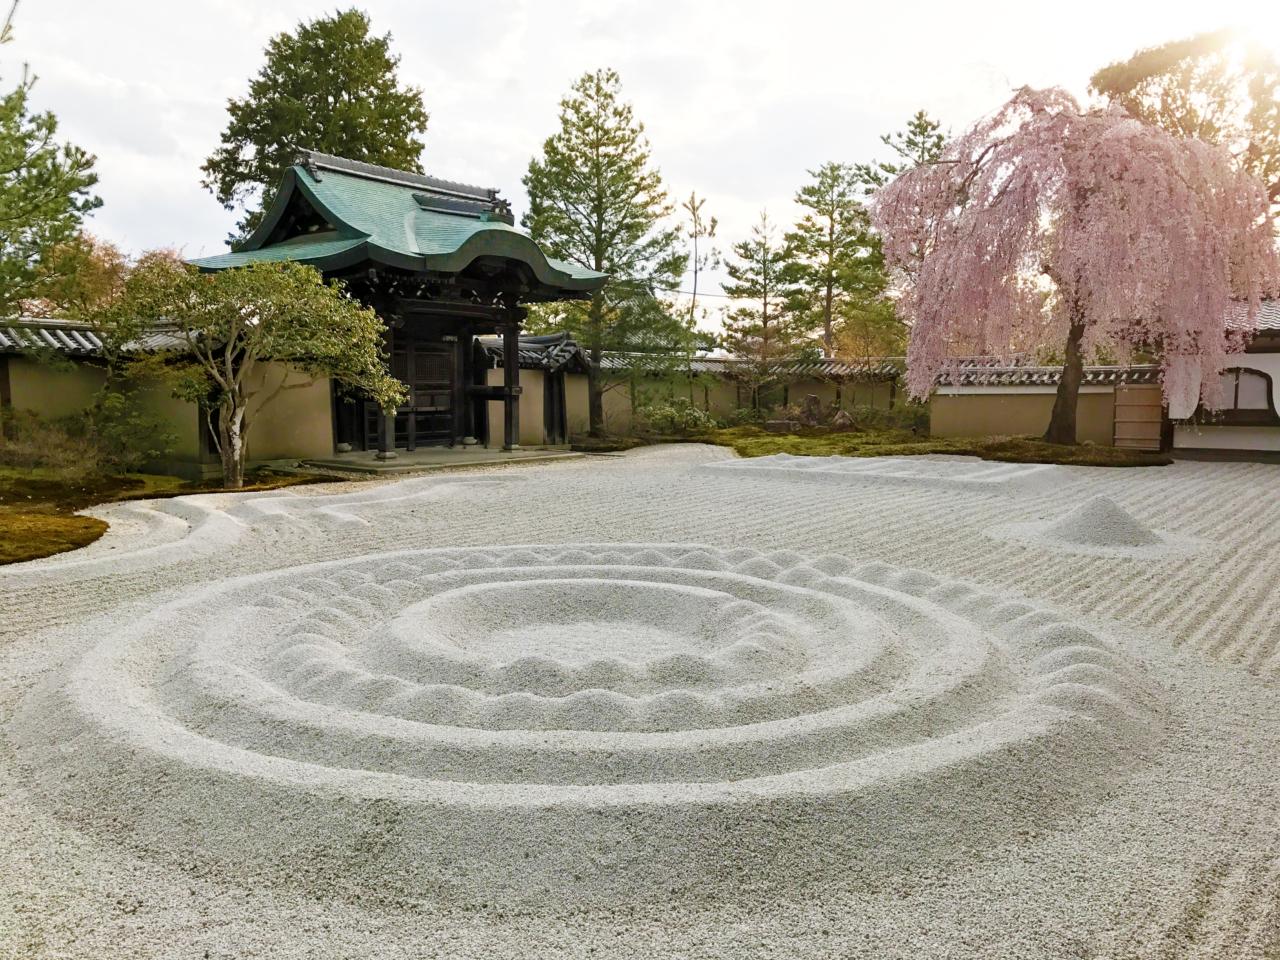 高台寺の方丈庭園・波心庭